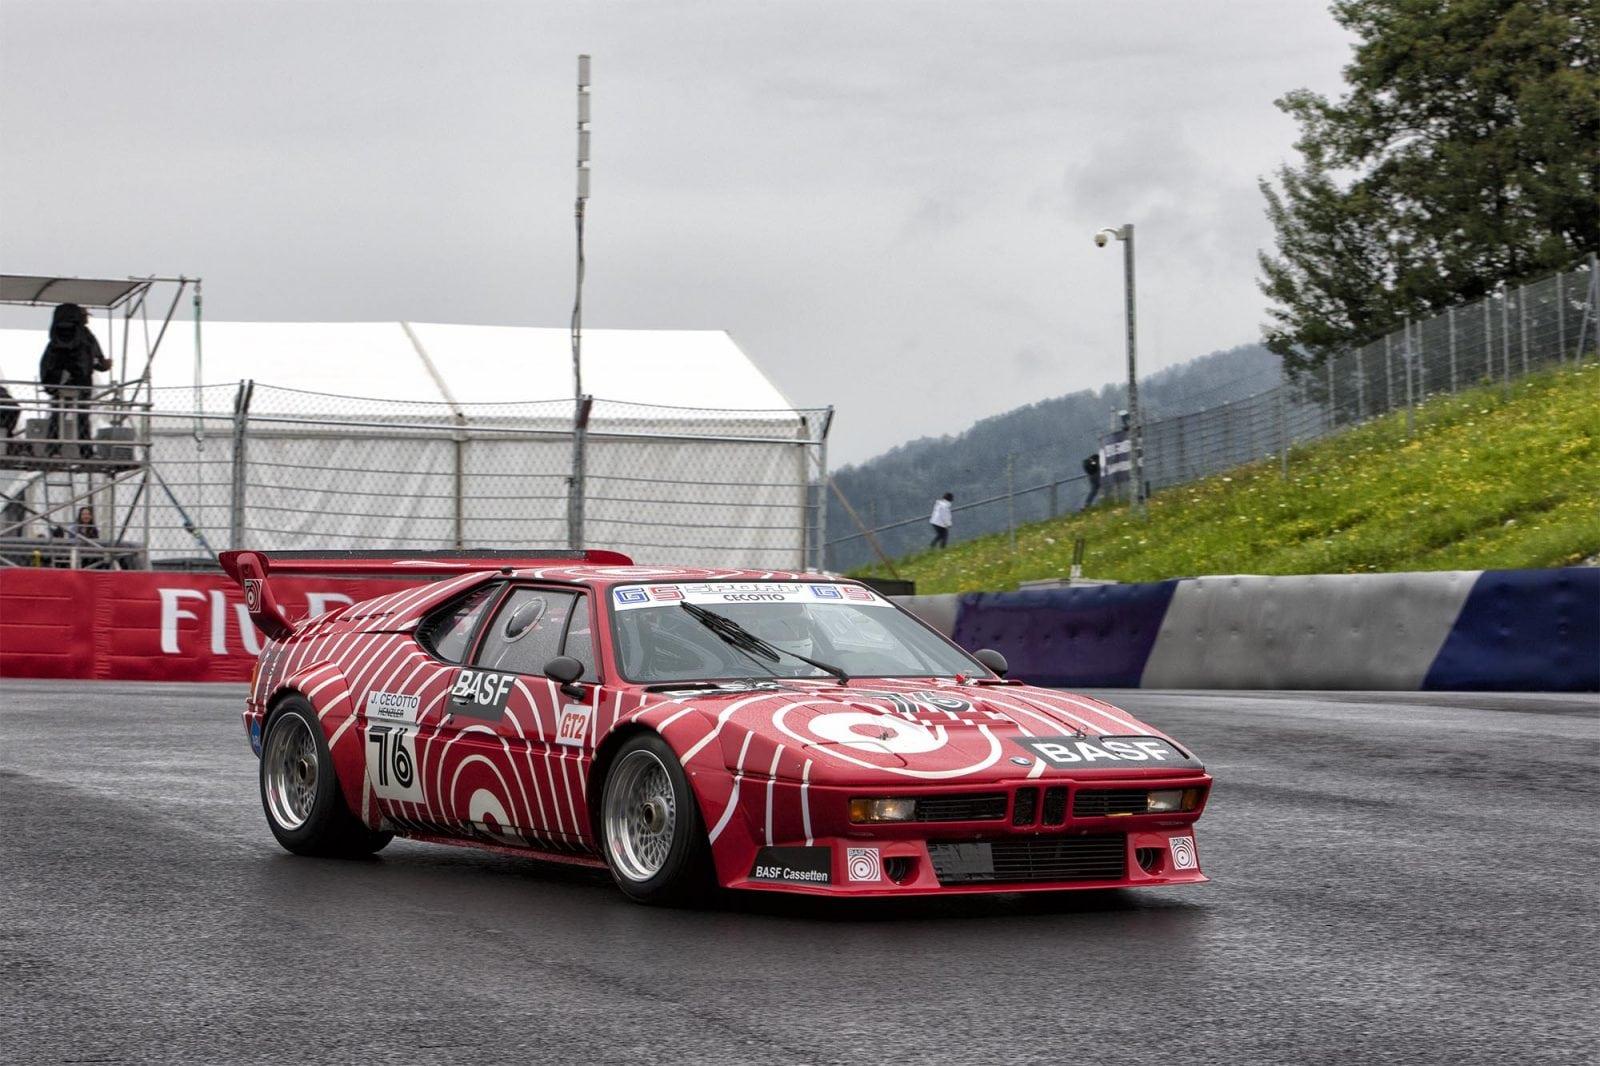 BMW M1 Procar #76 – Johnny Cecotto